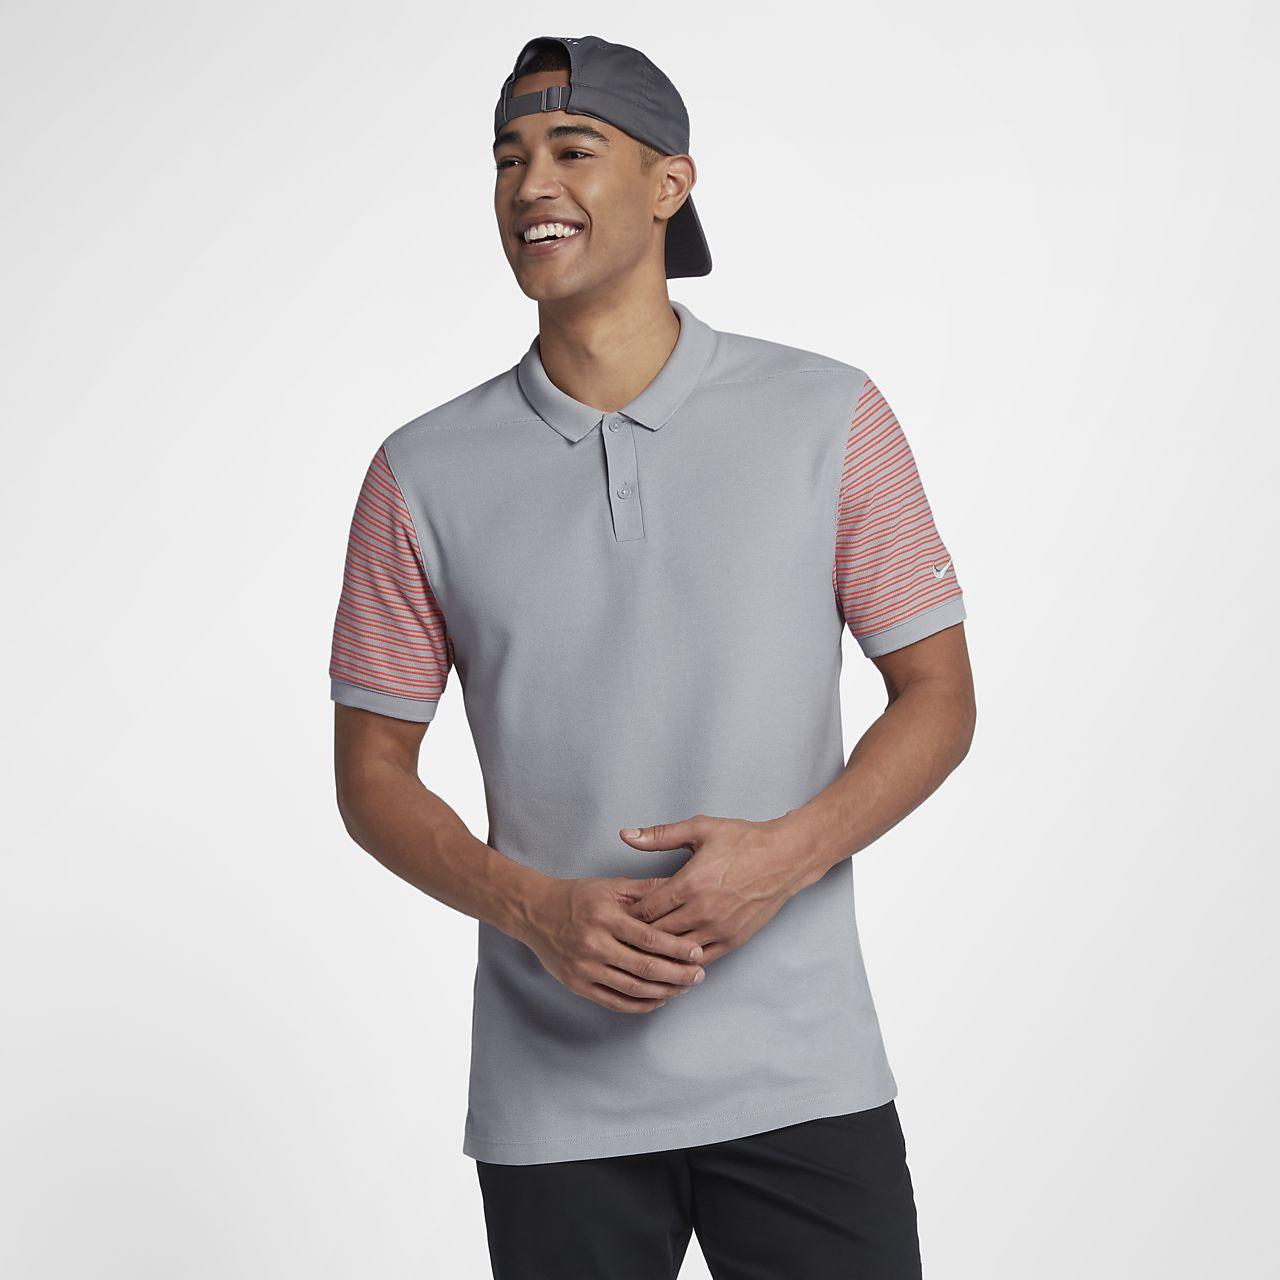 cc589dda Nike Polo T Shirt Size Chart | RLDM